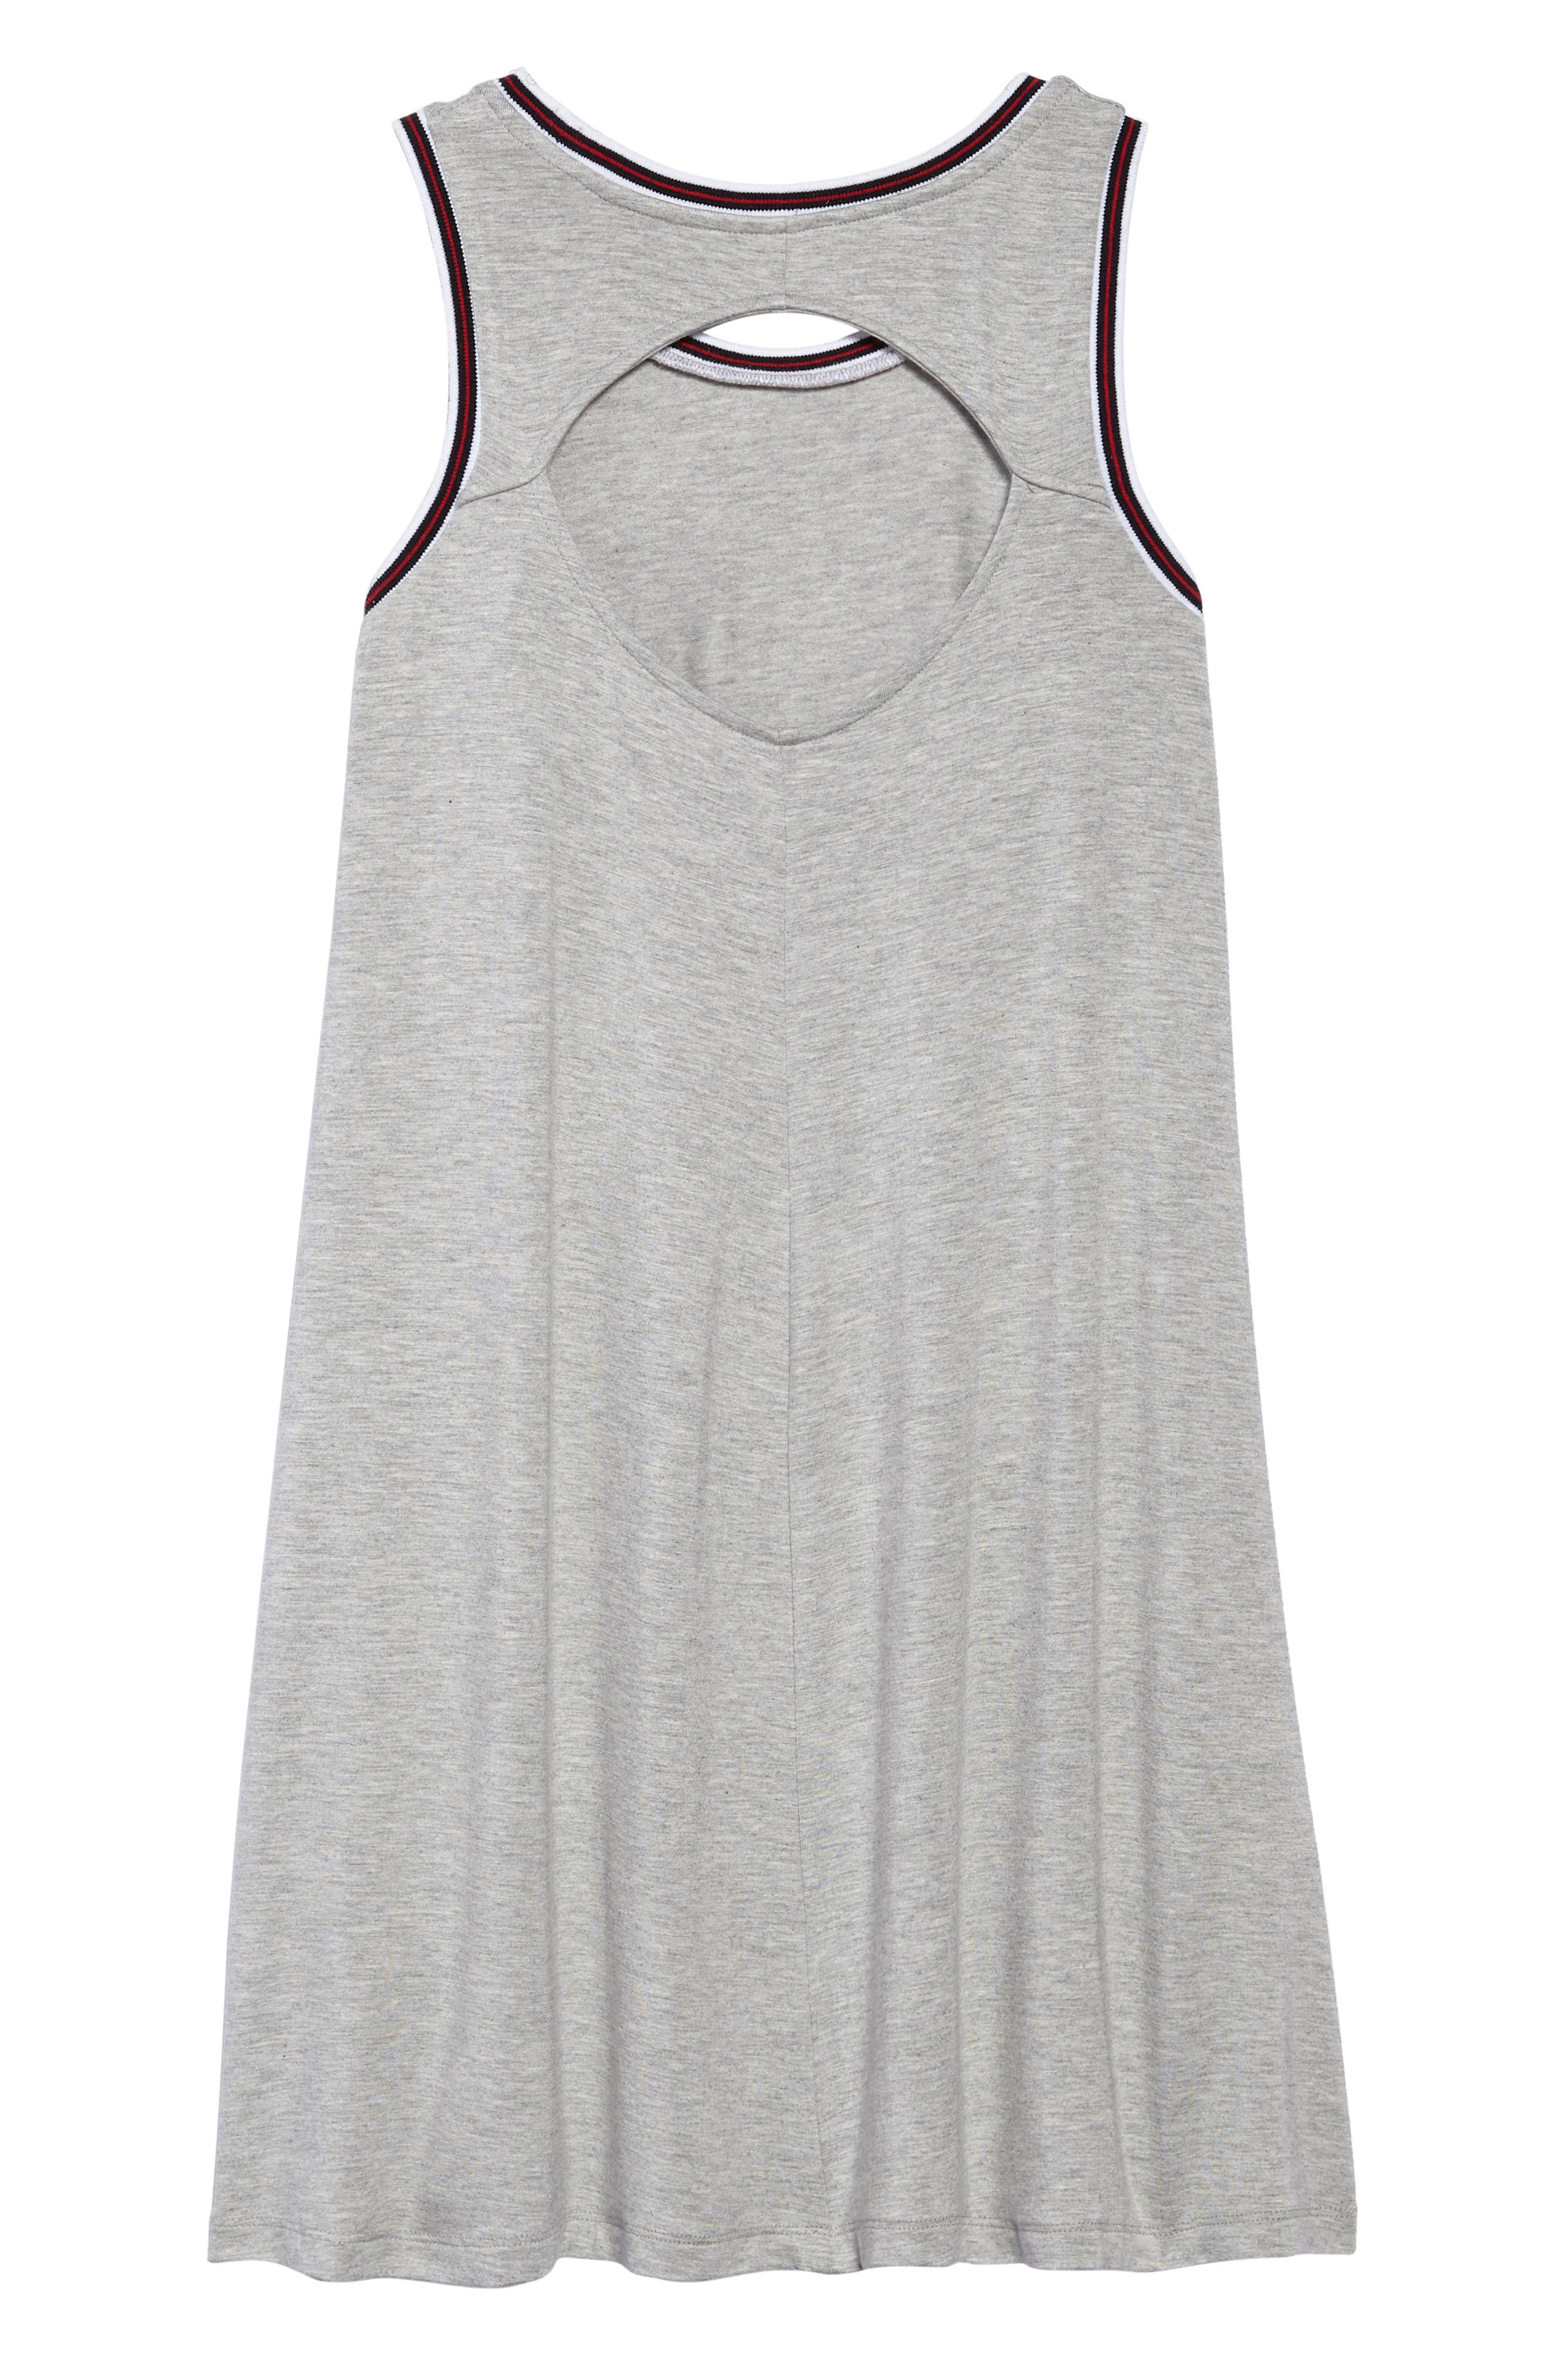 Athleisure Sleeveless Dress,                             Alternate thumbnail 2, color,                             020